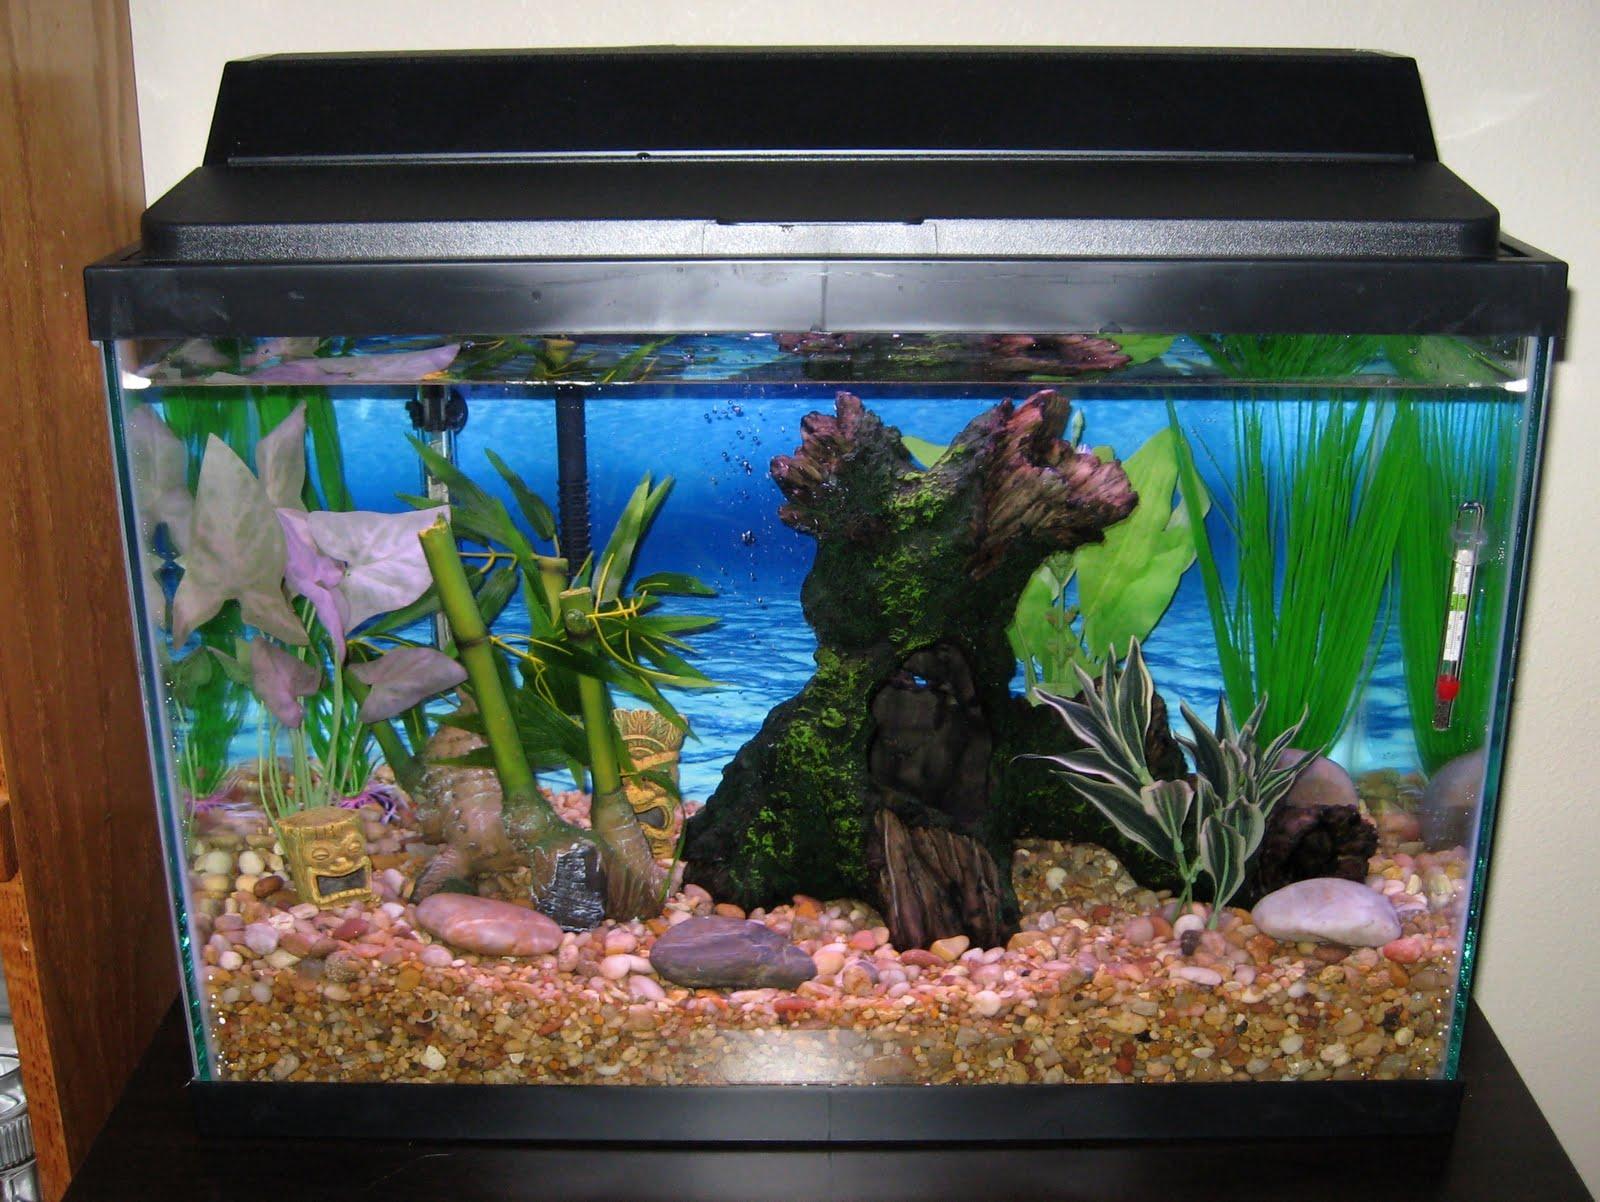 Fish tank setup ideas for Freshwater fish tank ideas